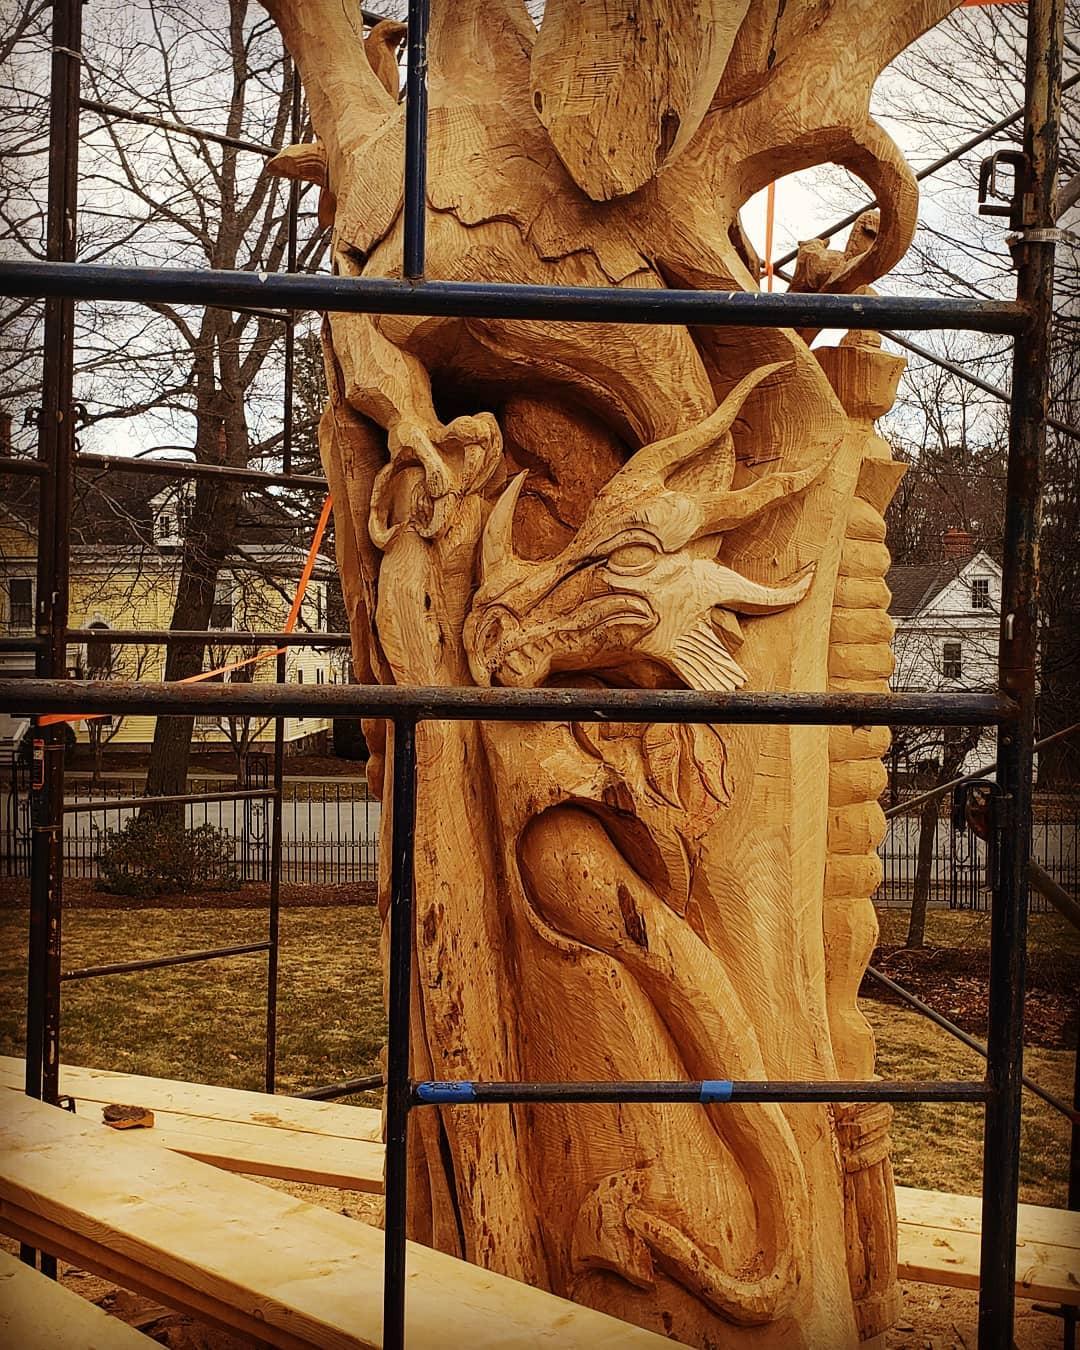 Stephenking Tabithaking Sculpture Maison 03